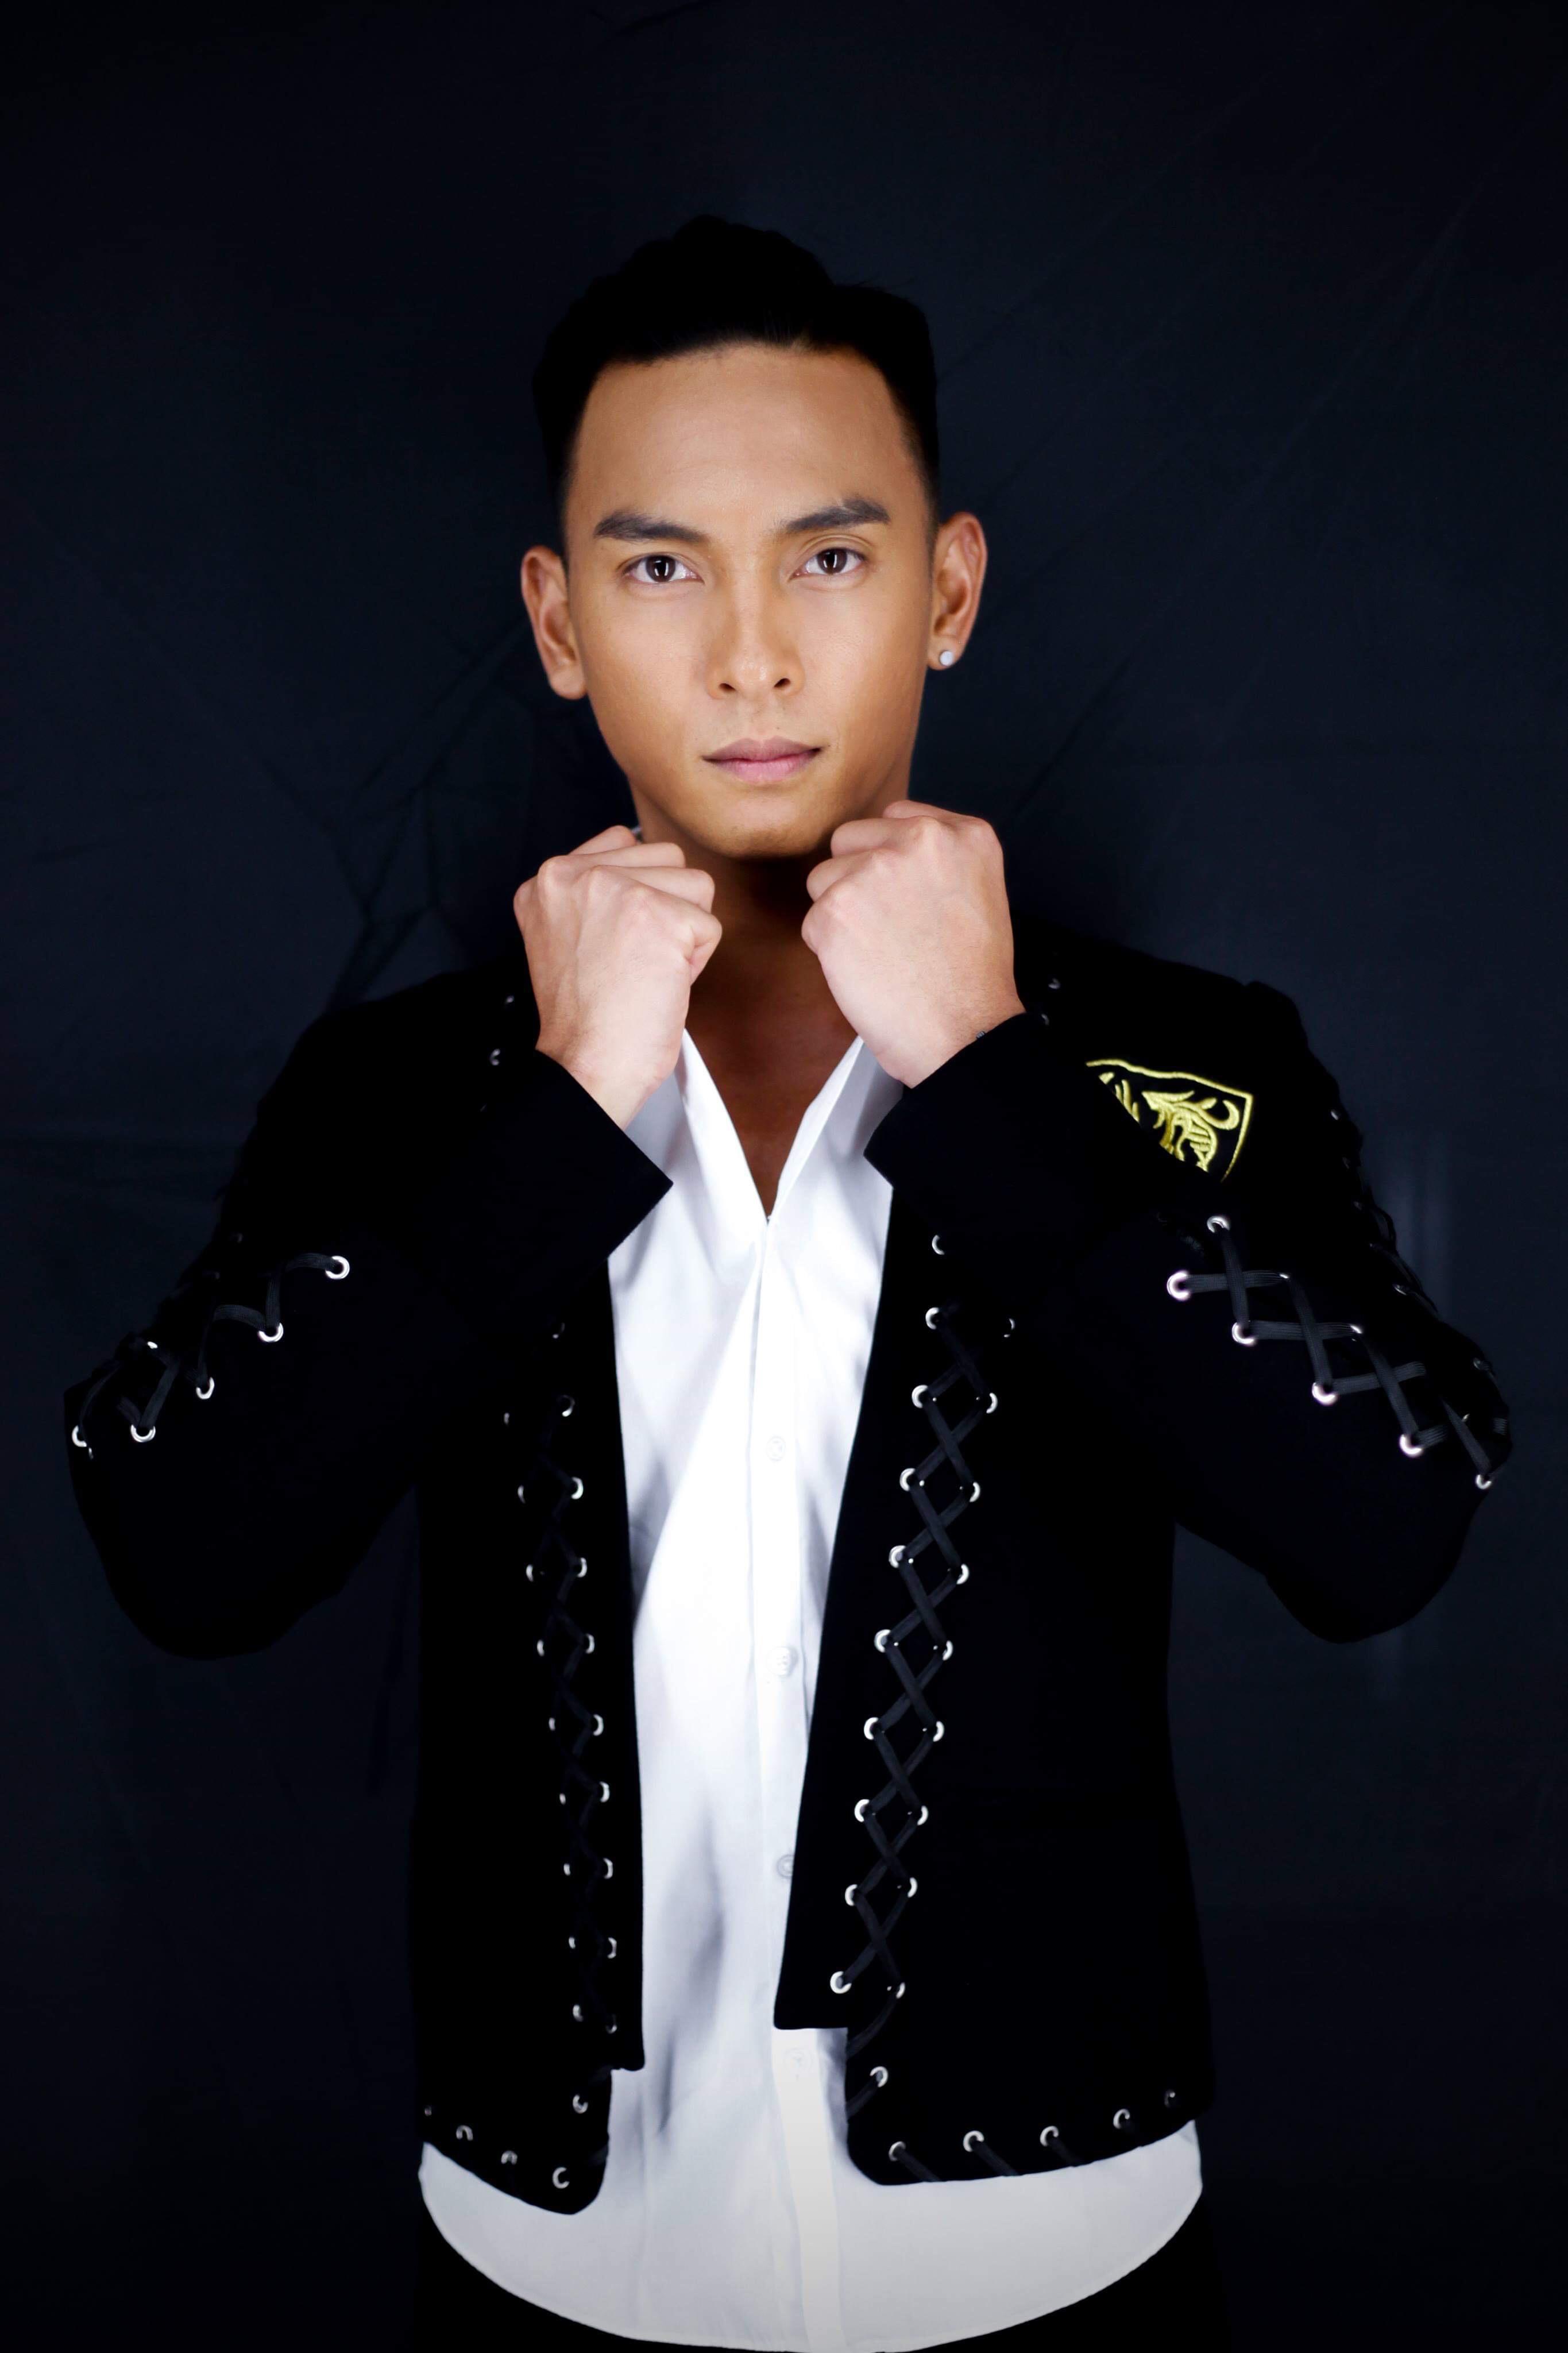 aj-mercado-2020-approved-black-jacket